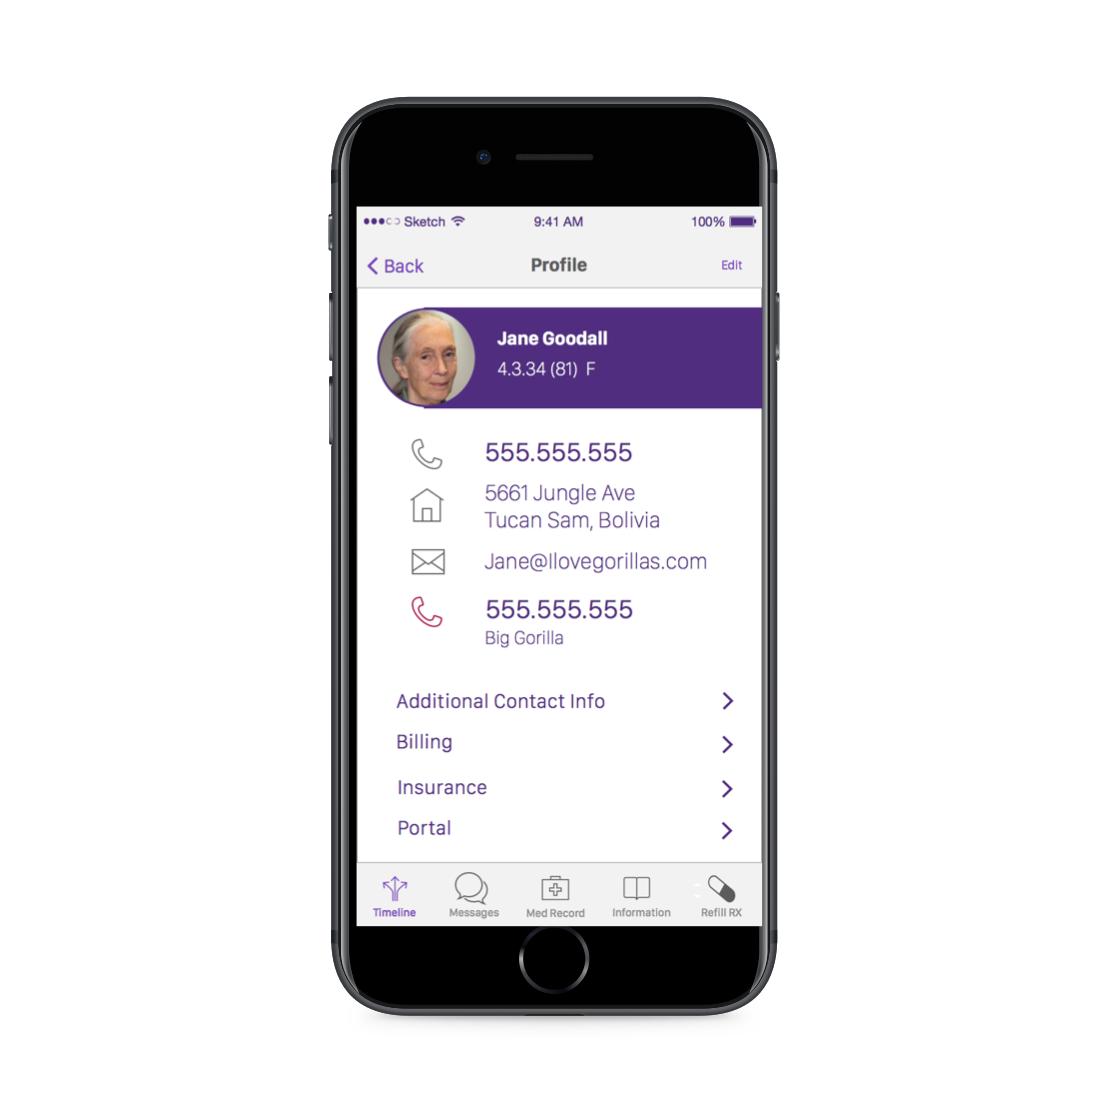 Mobile Healthcare UX: Design a better interface for a patient portal